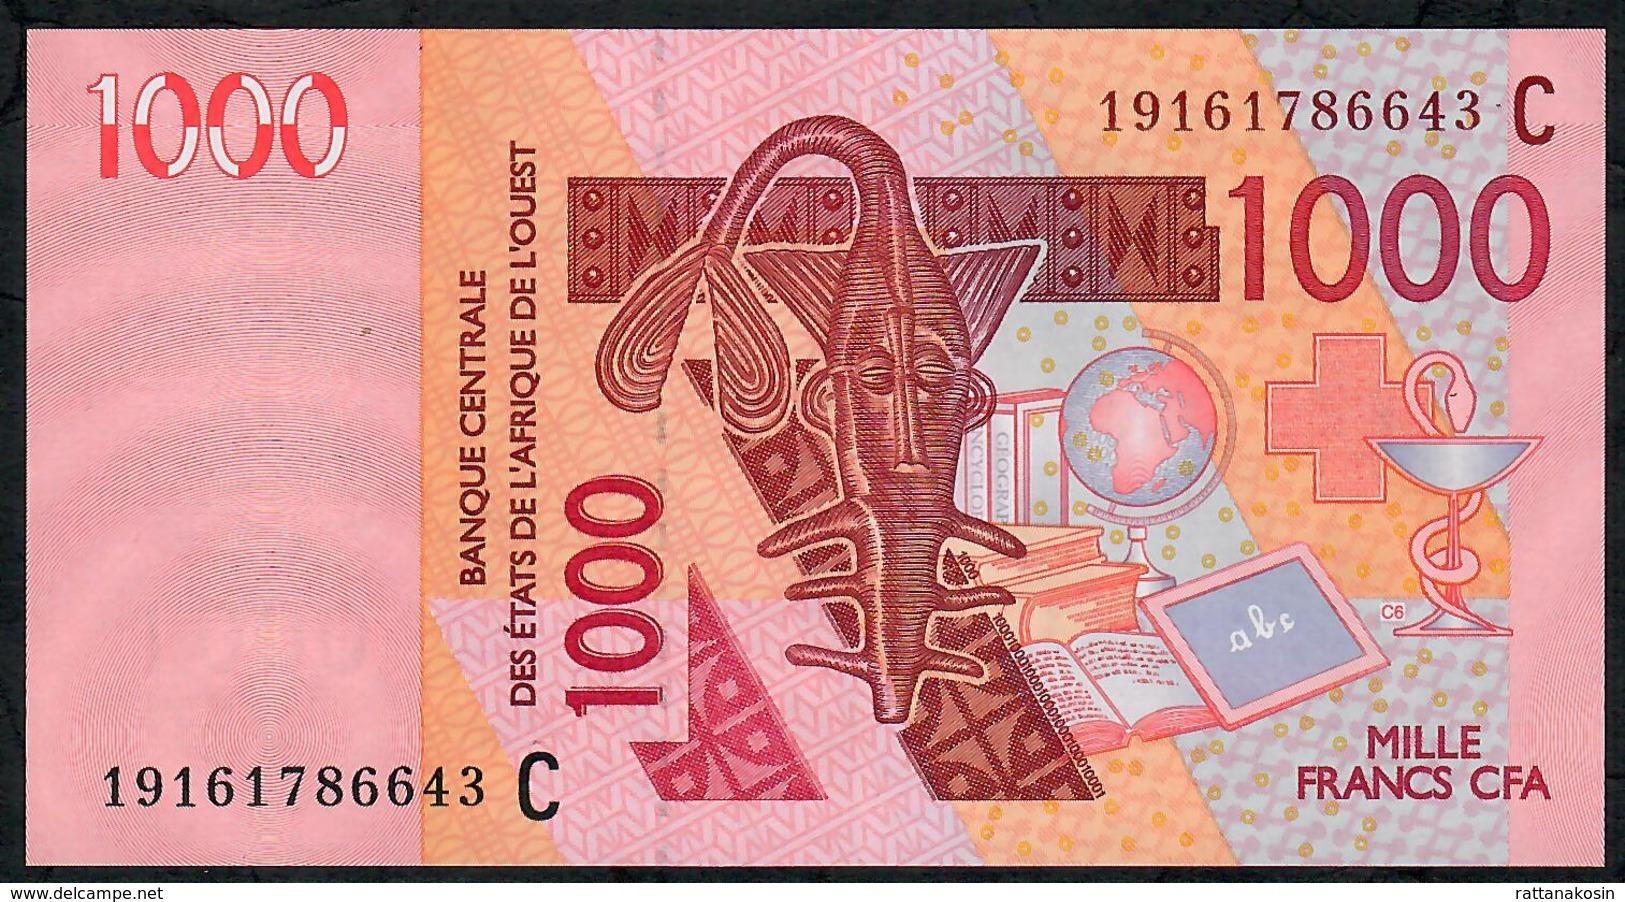 W.A.S. BURKINA FASO  P315Cs 1000 FRANCS (20)19 2019 UNC. - Estados De Africa Occidental